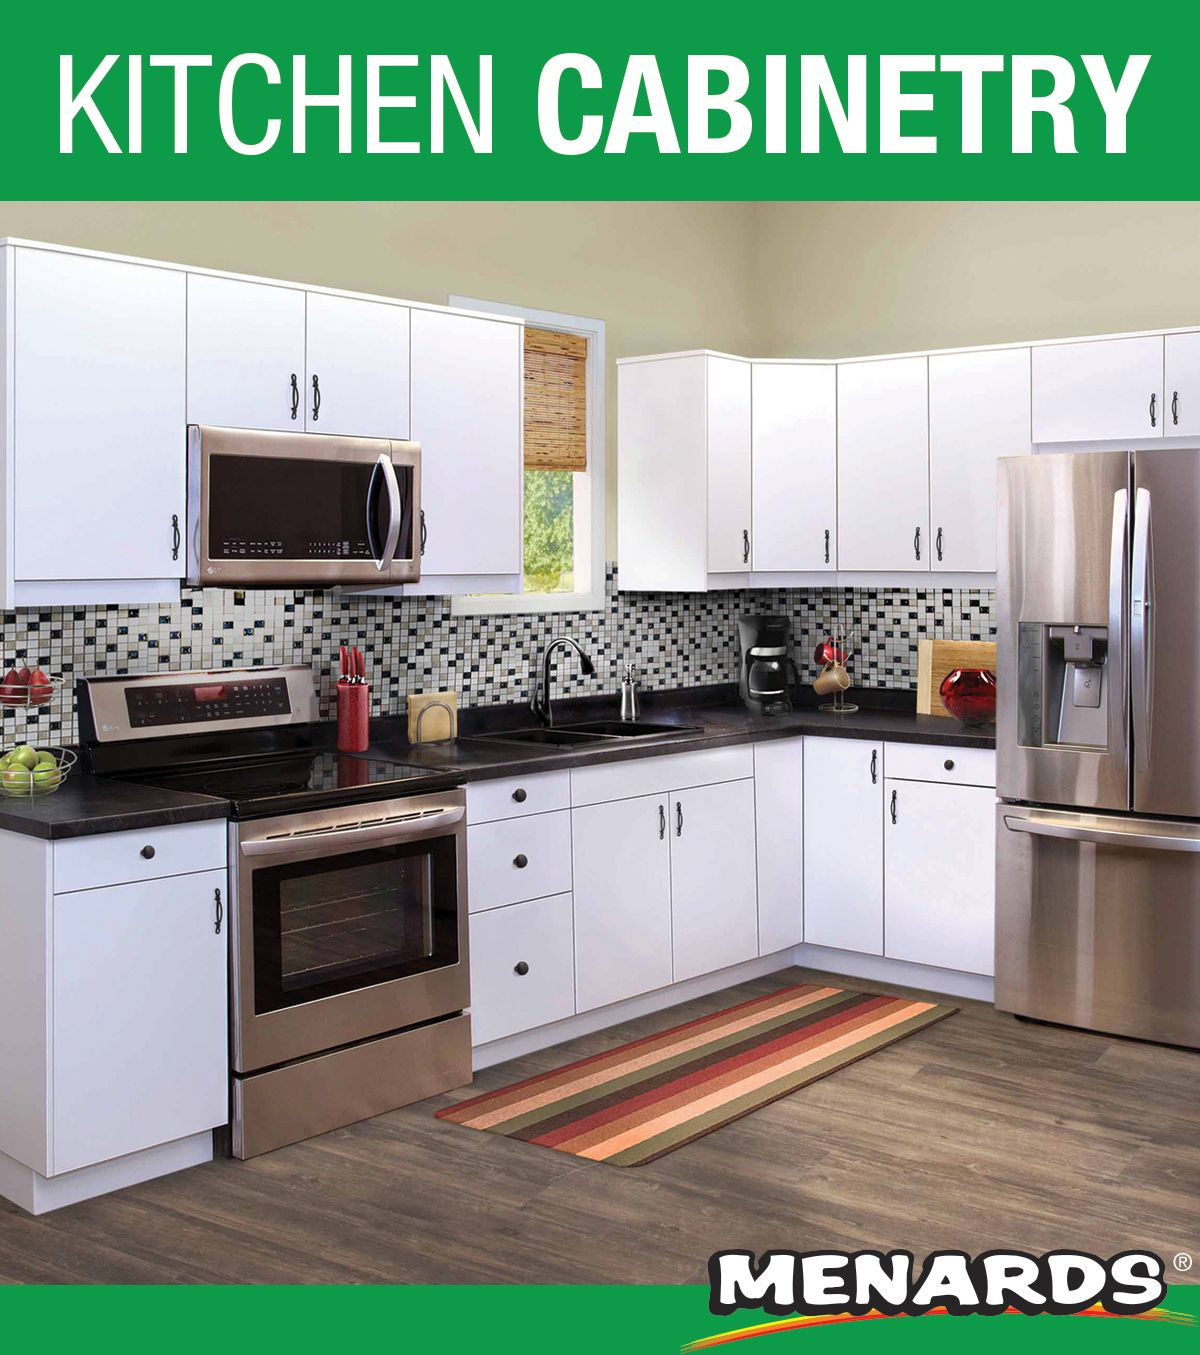 Klearvue Oland White L Shaped Kitchen W 10 Cabinet Cabinets Only In 2020 Menards Kitchen Kitchen Backsplash Images Kitchen Decor